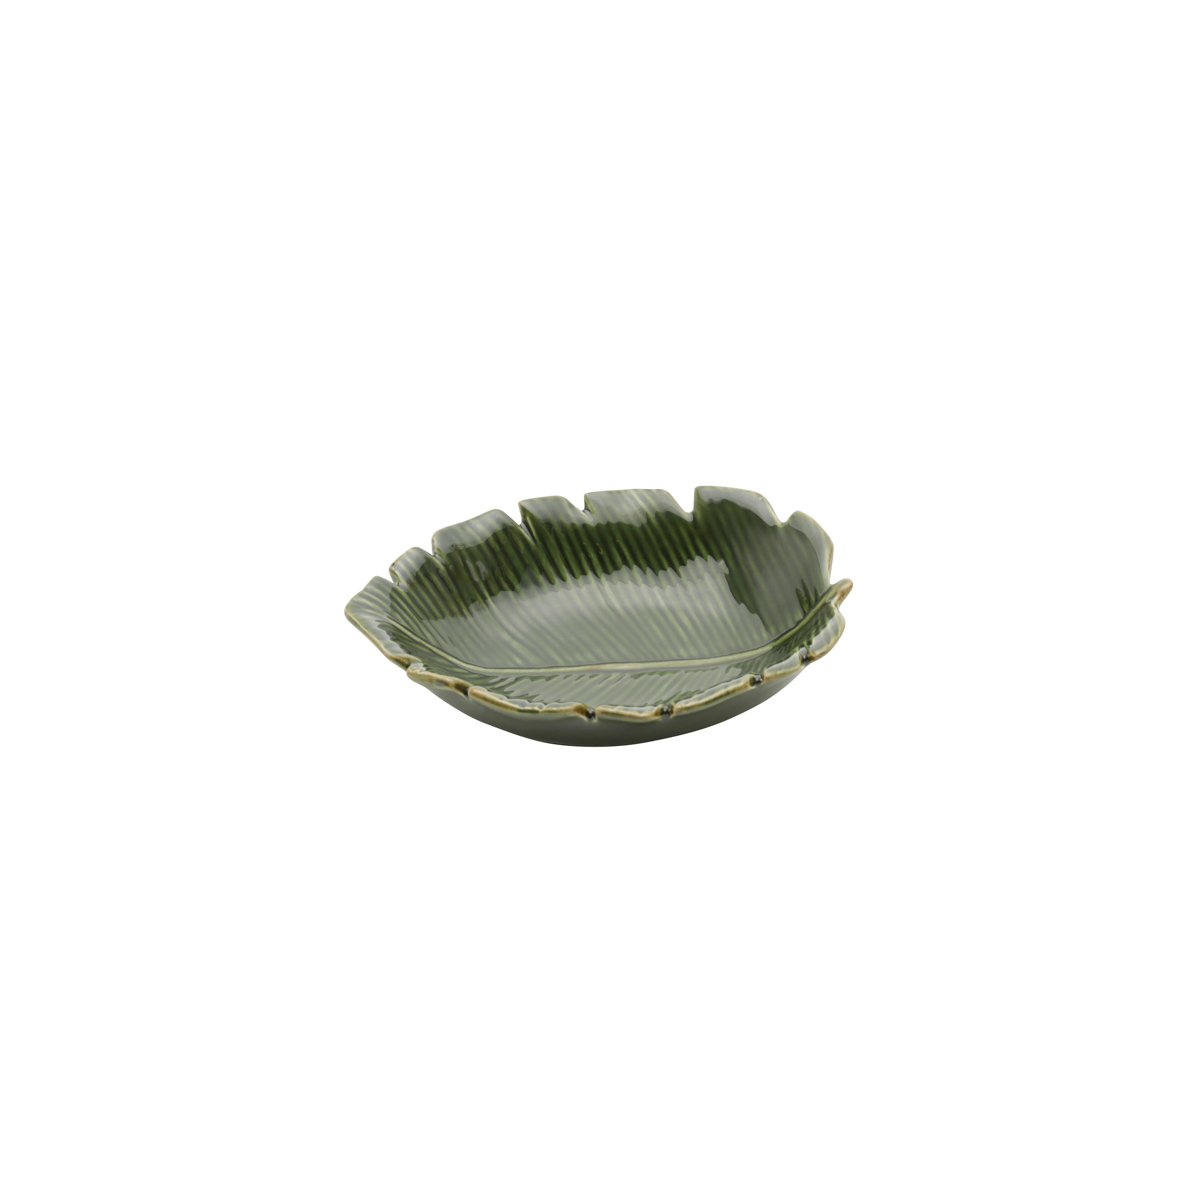 Folha decorativa cerâmica Banana Leaf verde 16x12x4cm Lyor